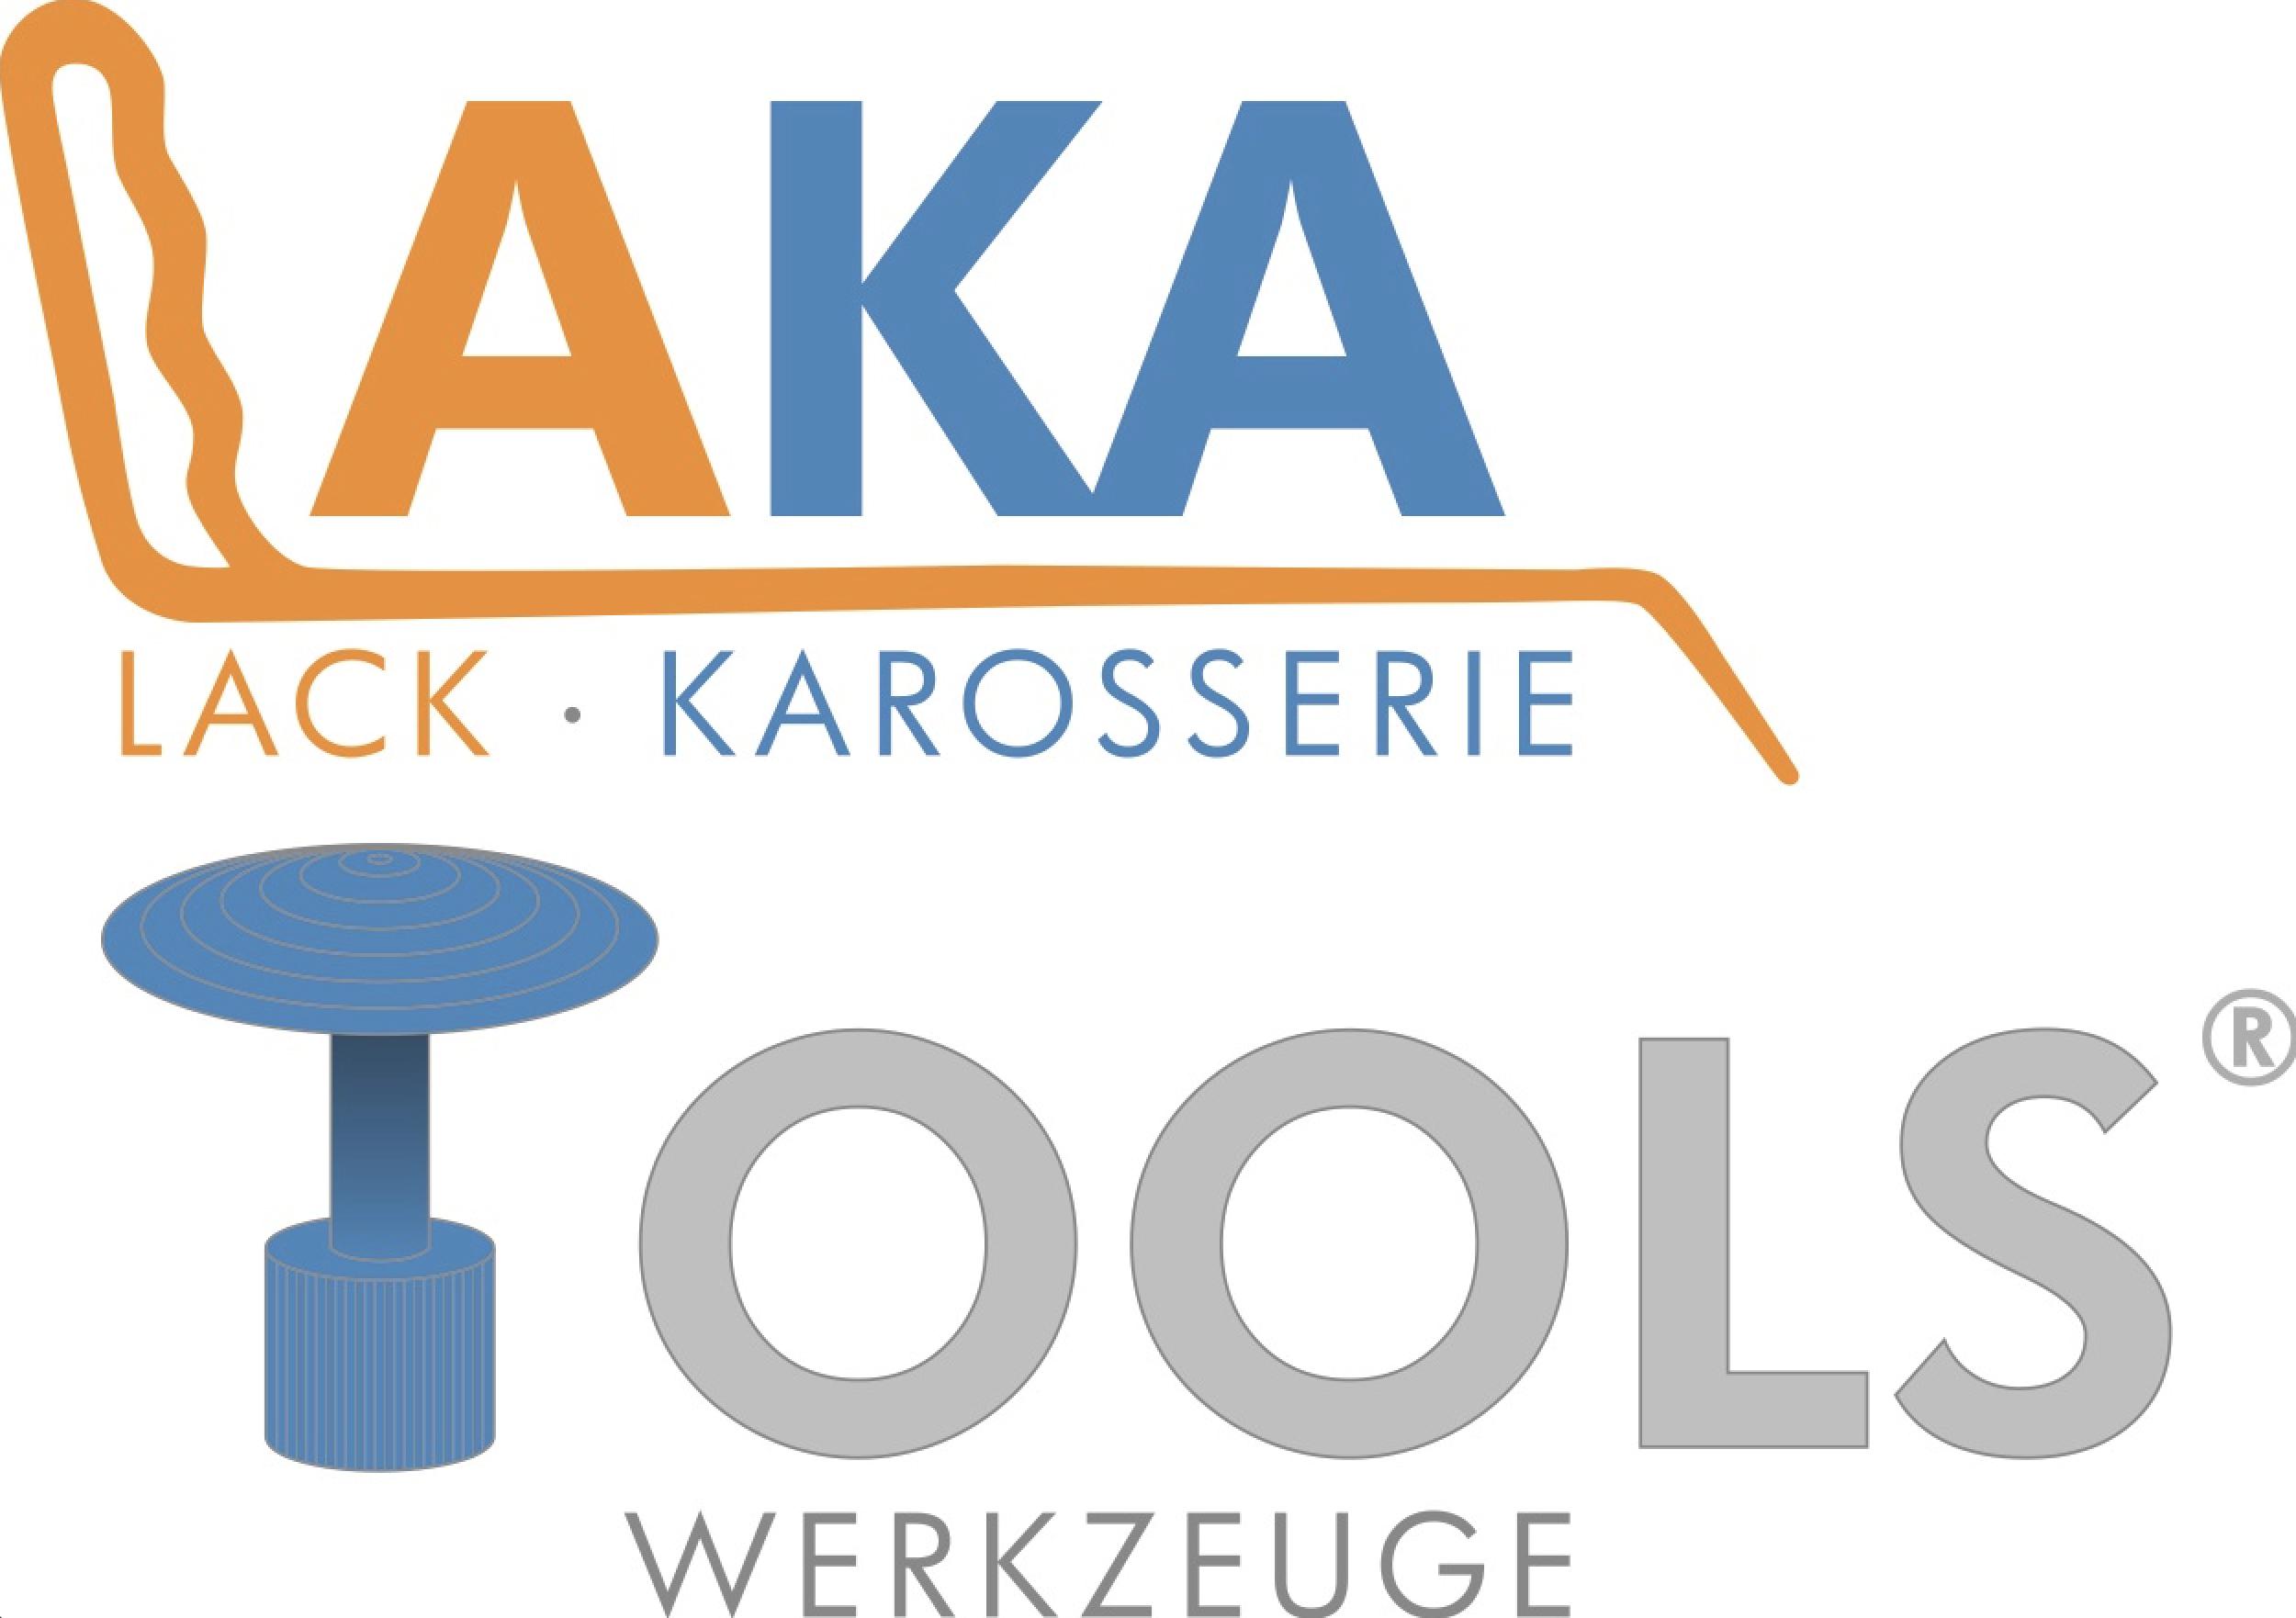 LAKA-TOOLS Onlinestore